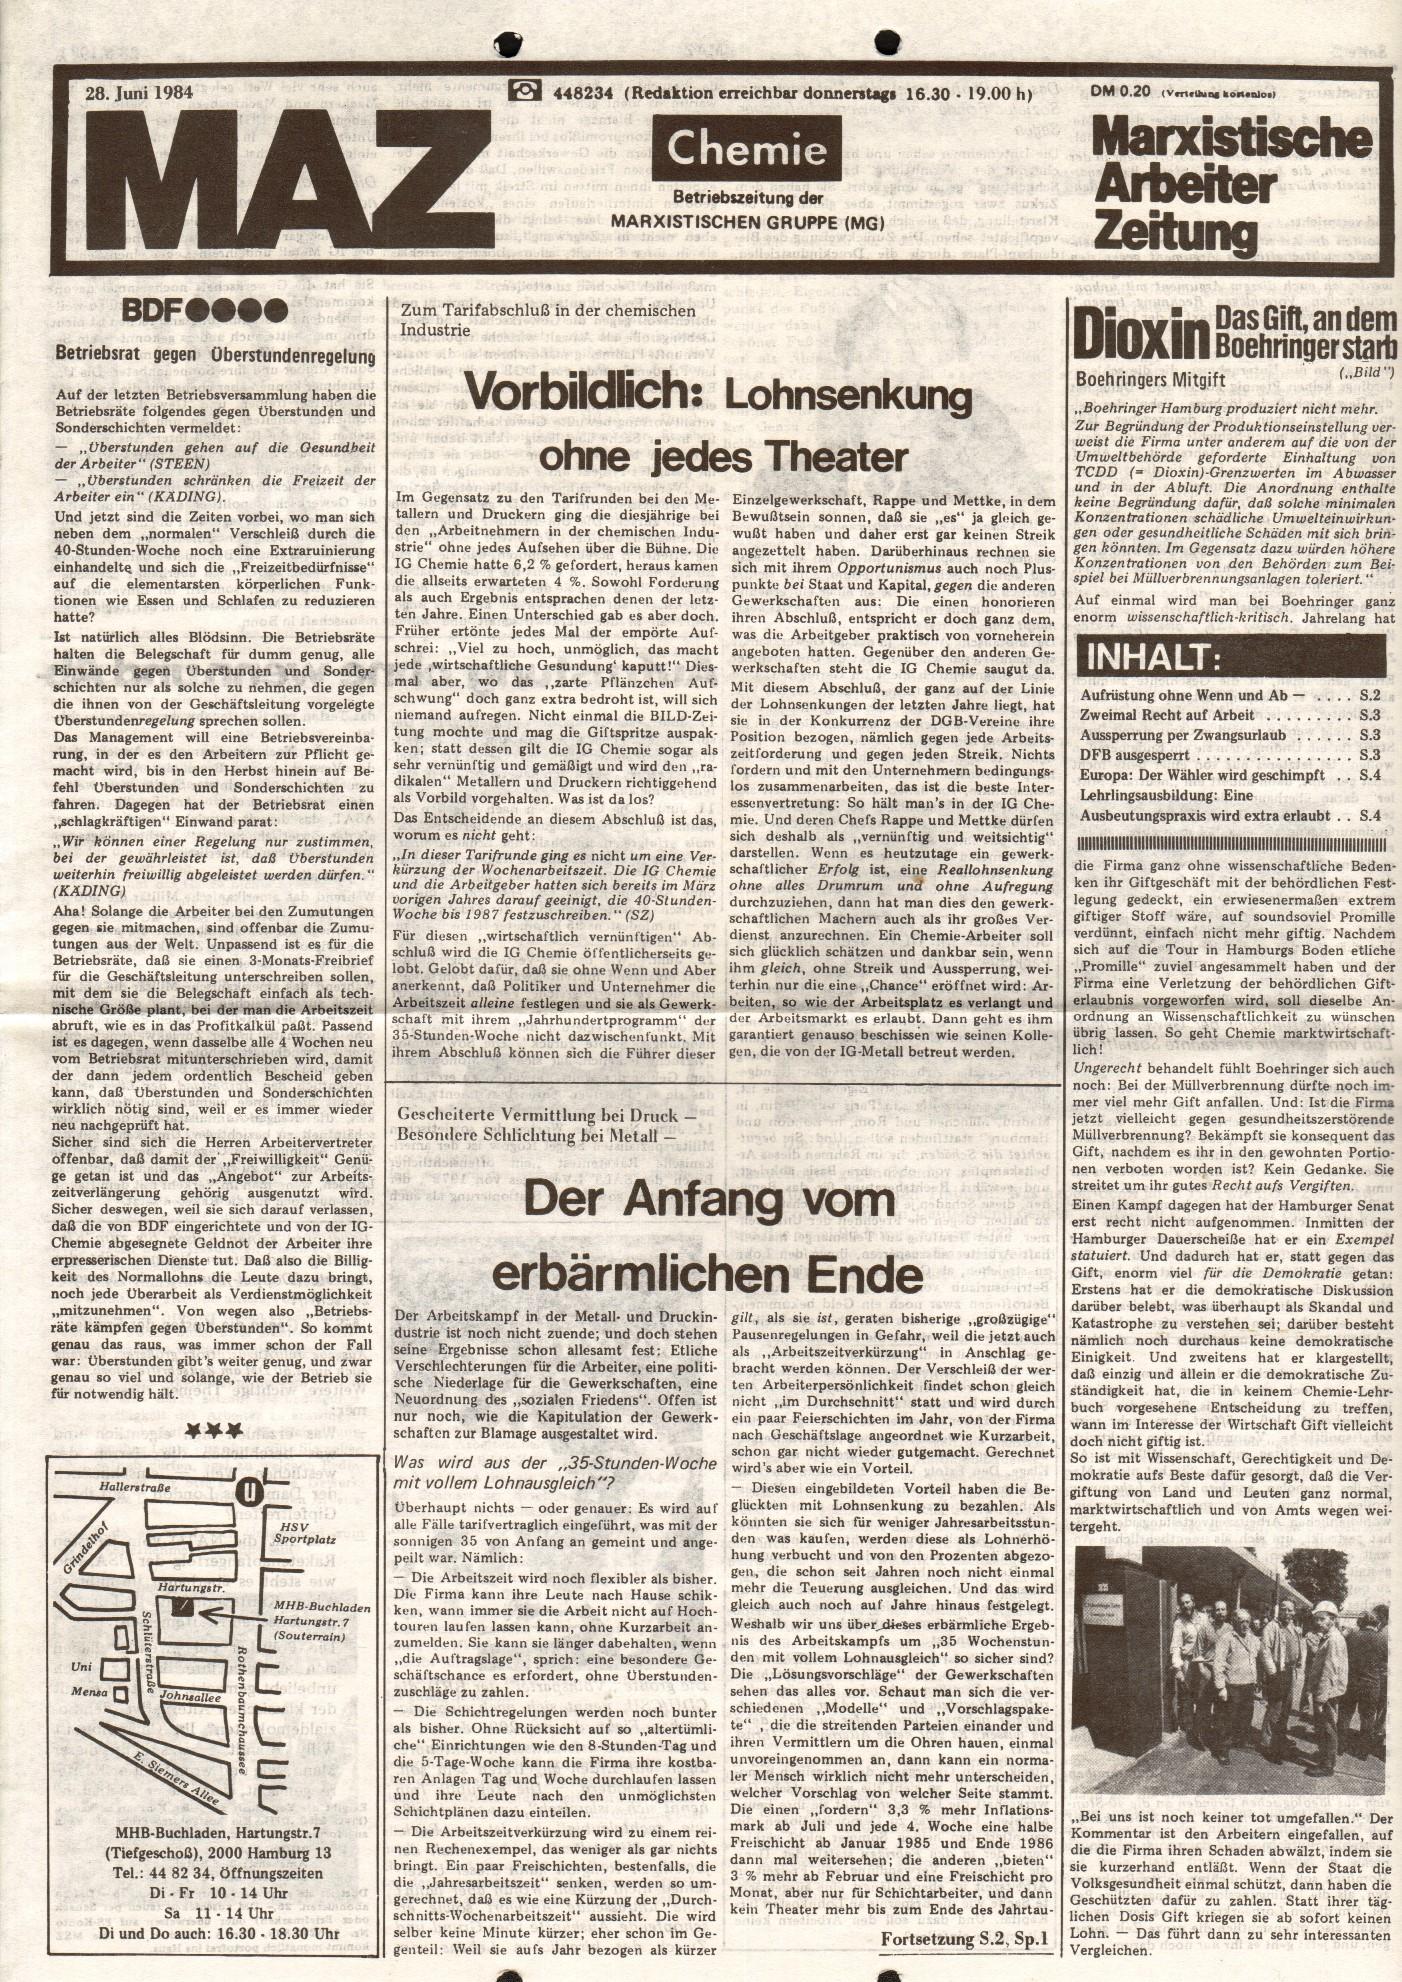 Hamburg_MG_MAZ_Chemie_19840628_01